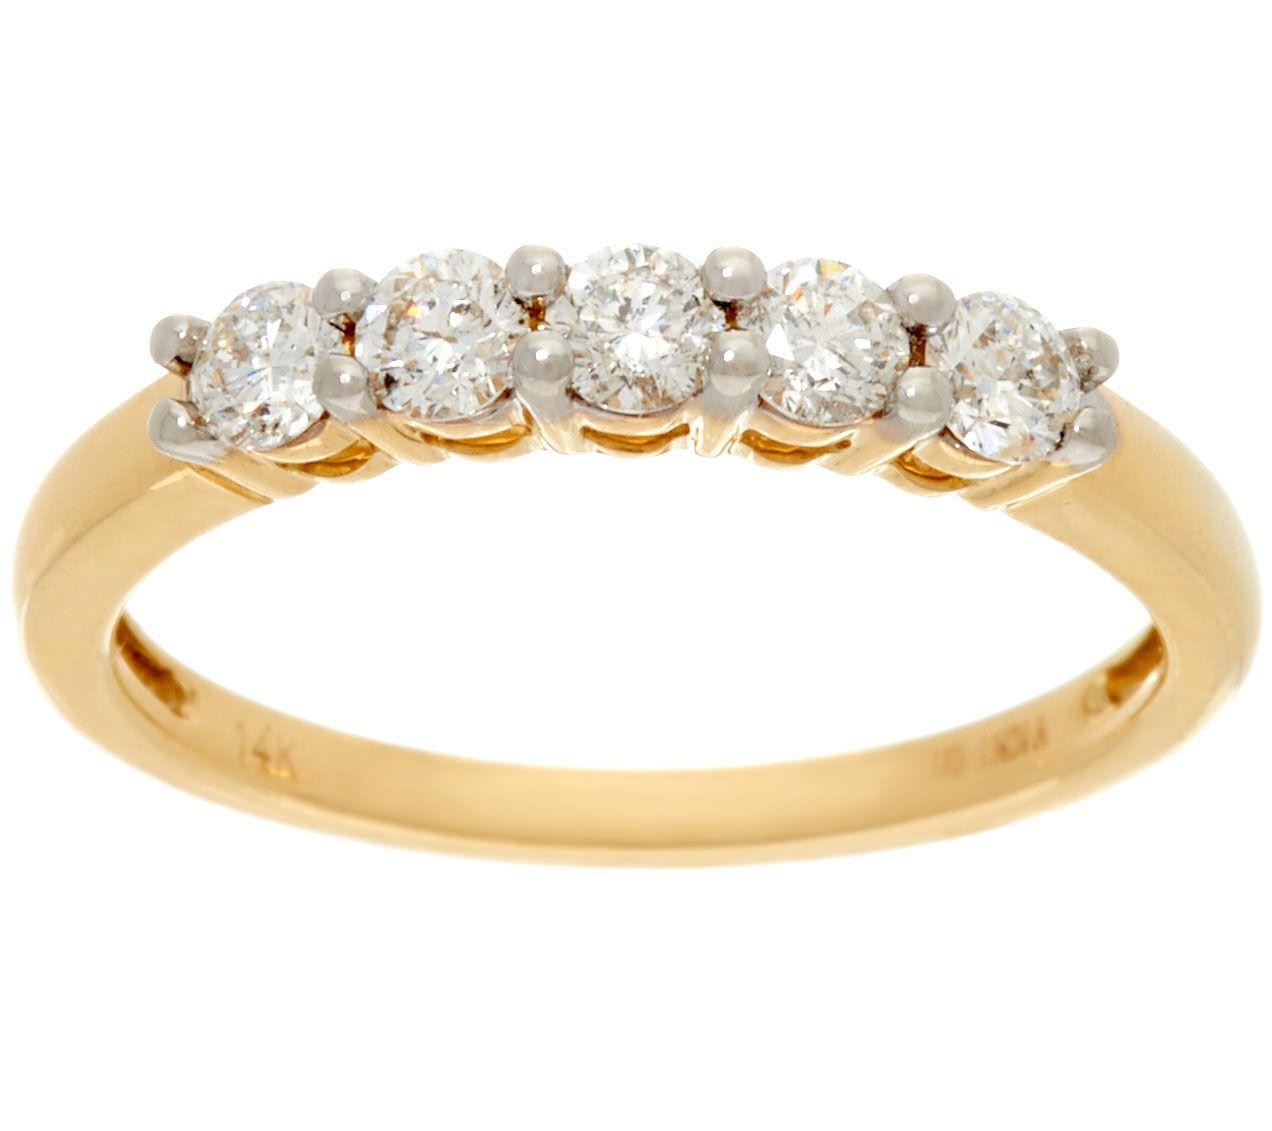 12 Cttw 5 Stone Diamond Band Ring 14K Gold Affinity